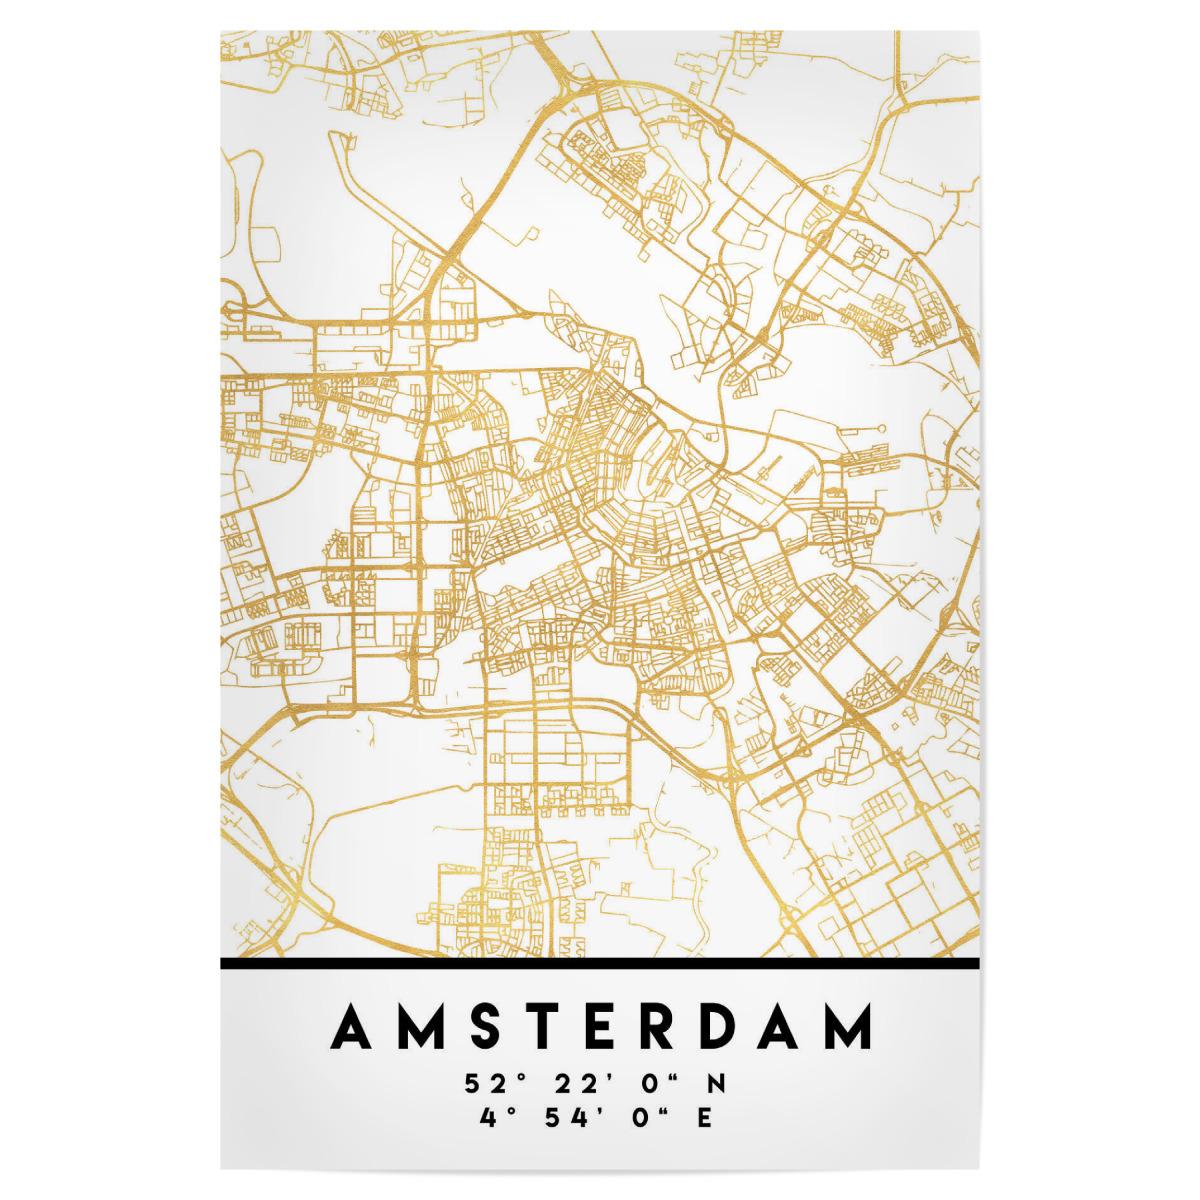 AMSTERDAM HOLLAND STREET MAP ART als Poster bei artboxONE kaufen